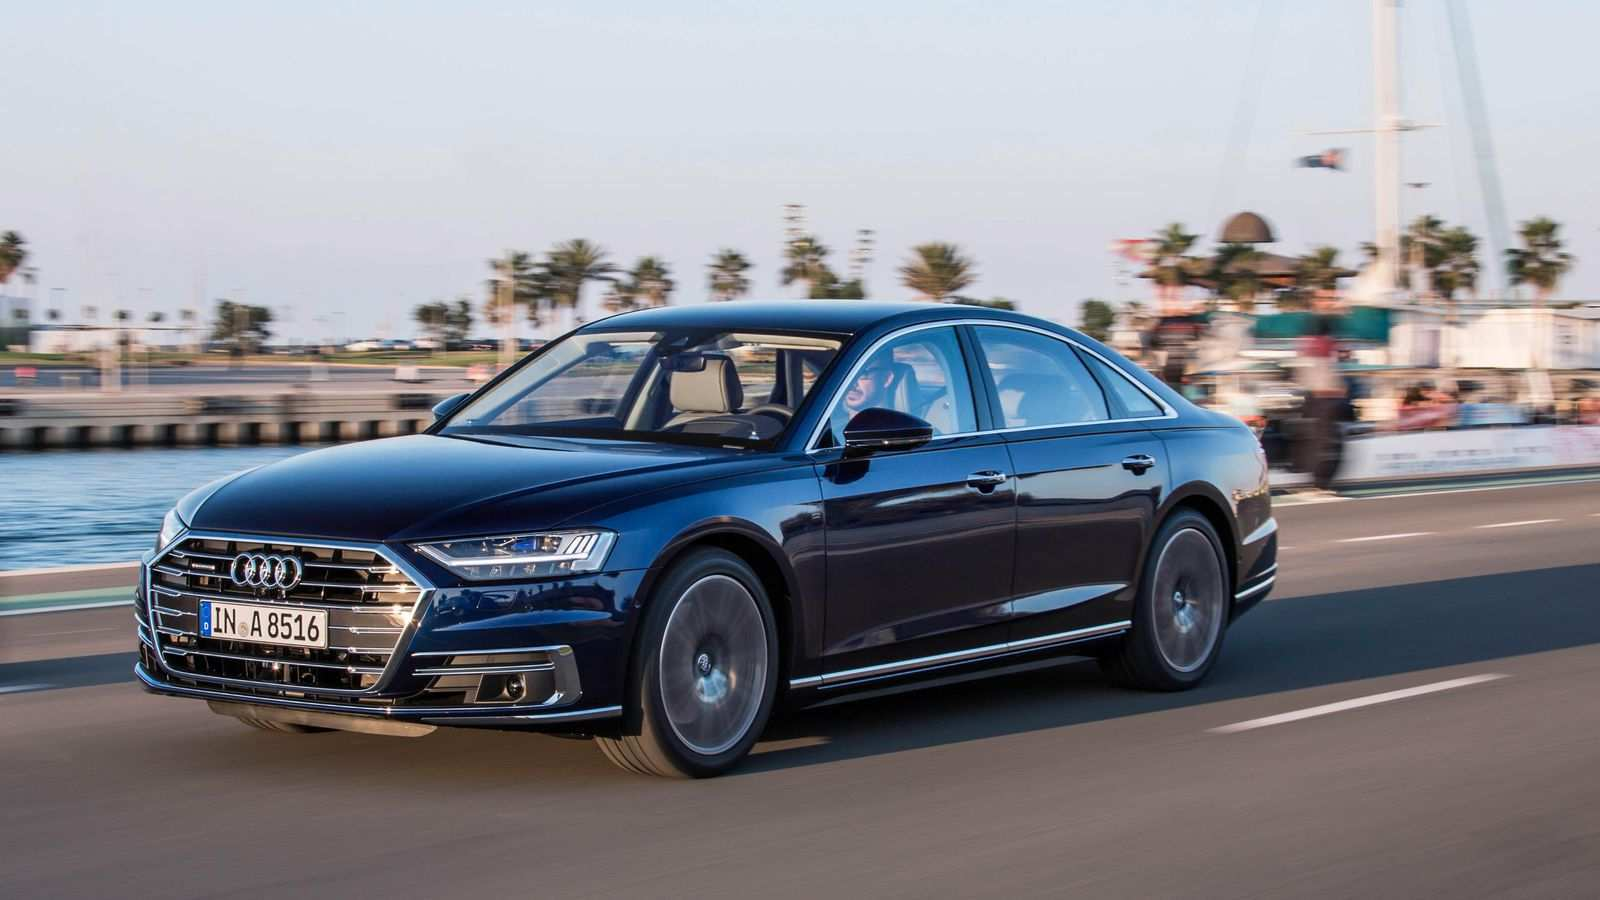 64 New 2019 Audi A8 L Picture by 2019 Audi A8 L